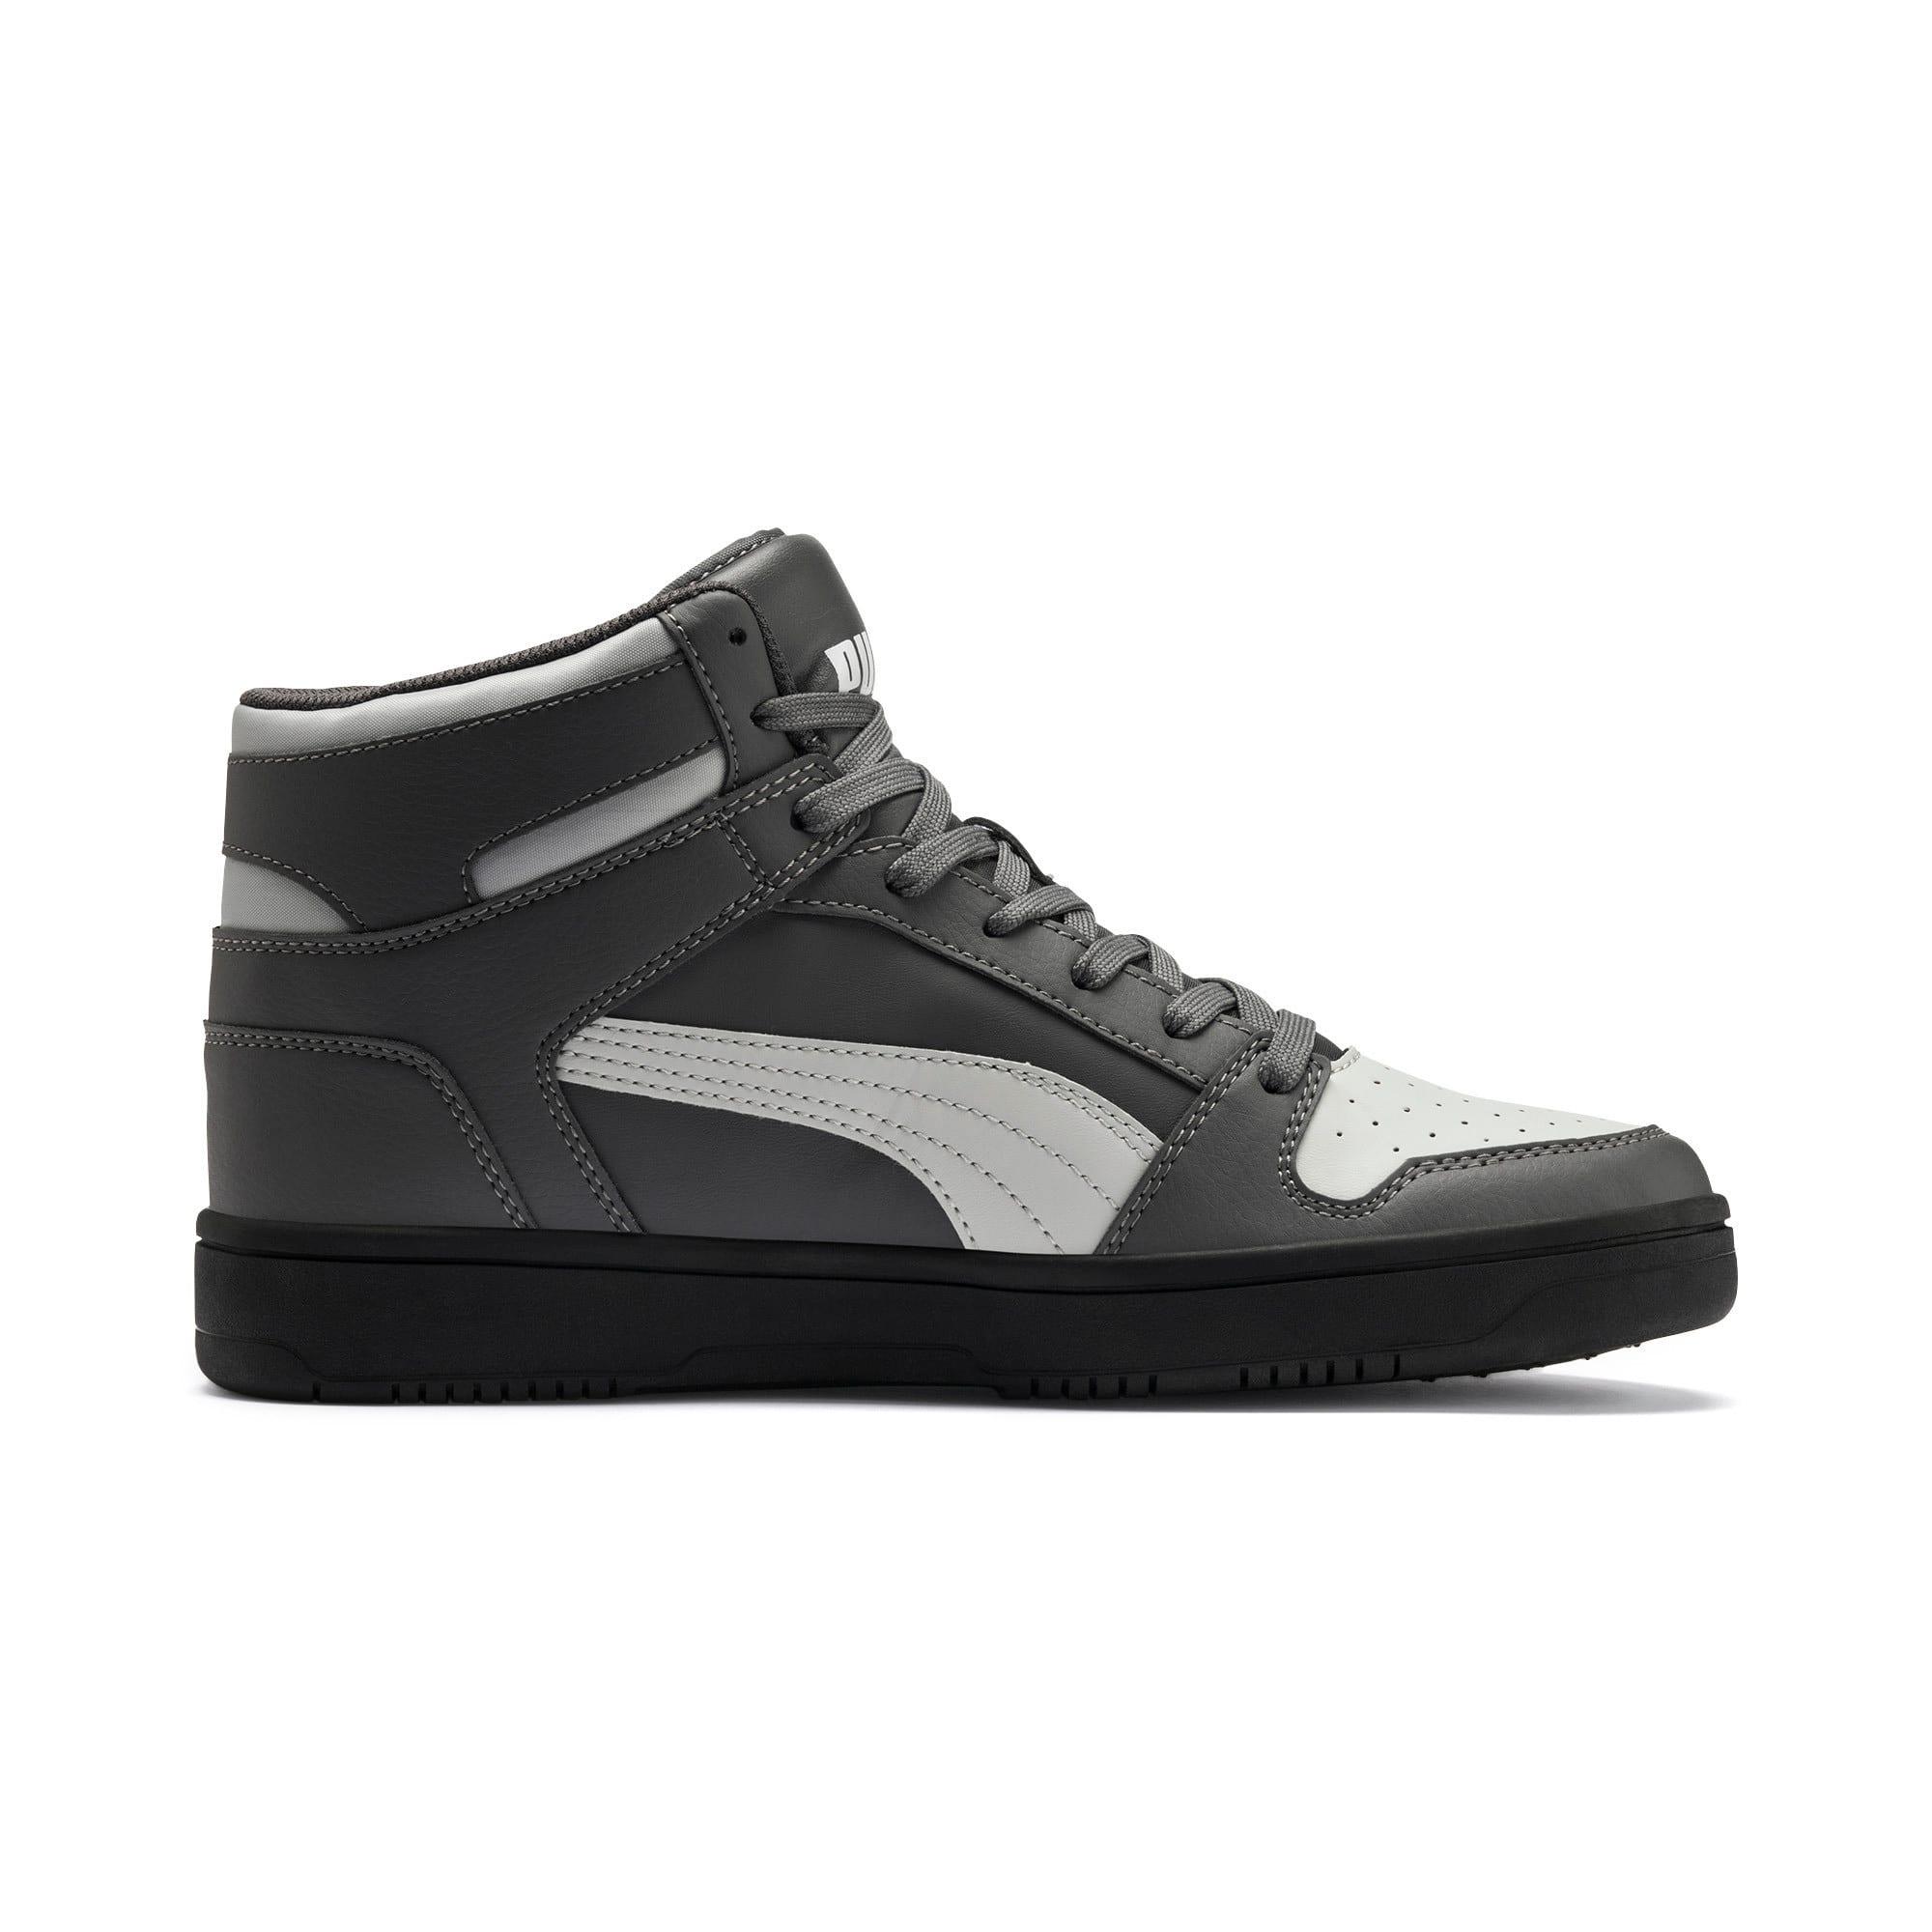 Thumbnail 6 of PUMA Rebound LayUp Sneakers, CASTLEROCK-HRise-White-Black, medium